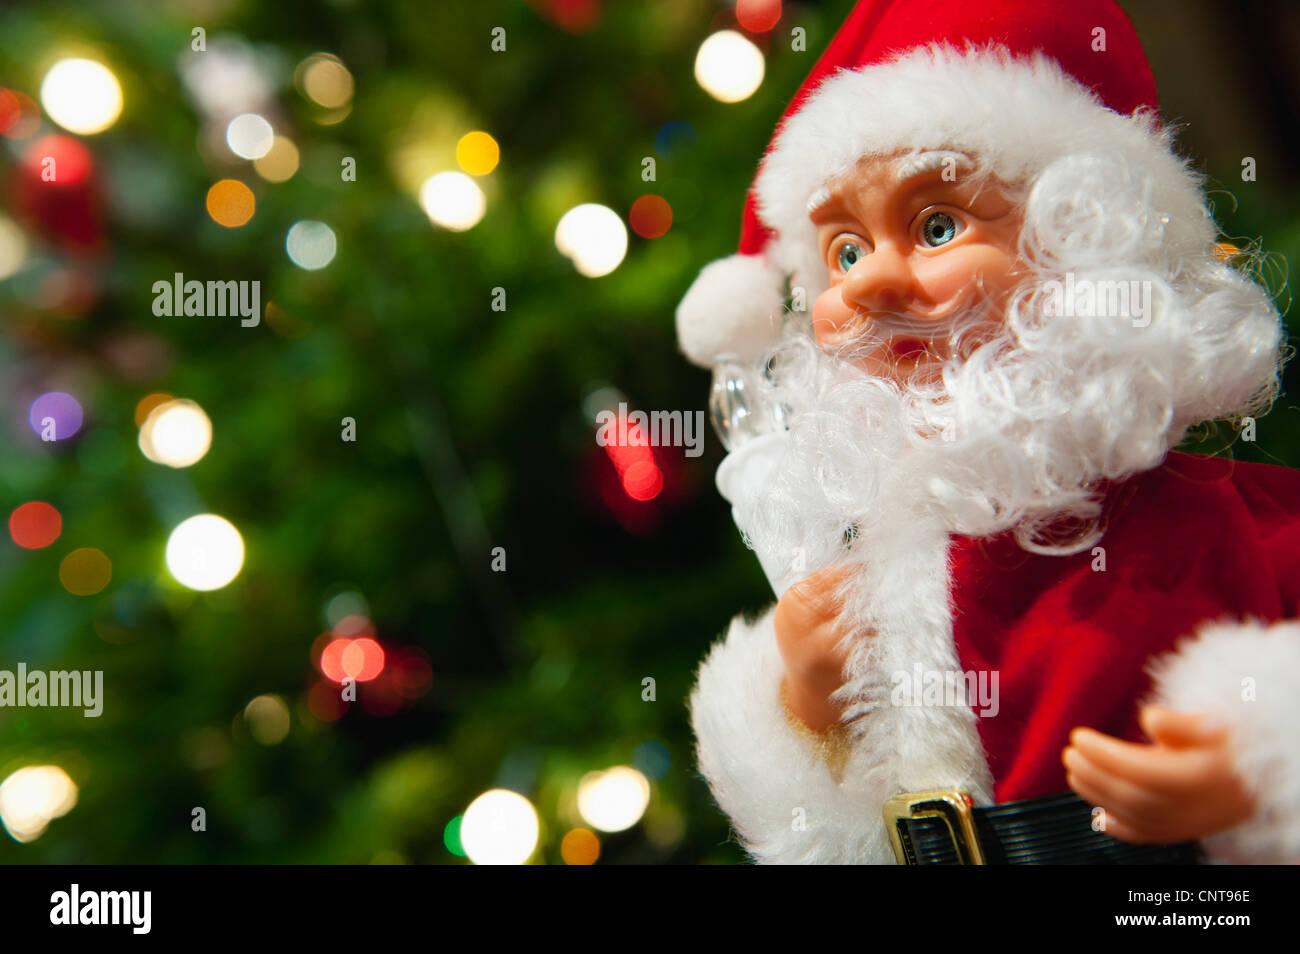 Santa Claus Christmas decoration - Stock Image